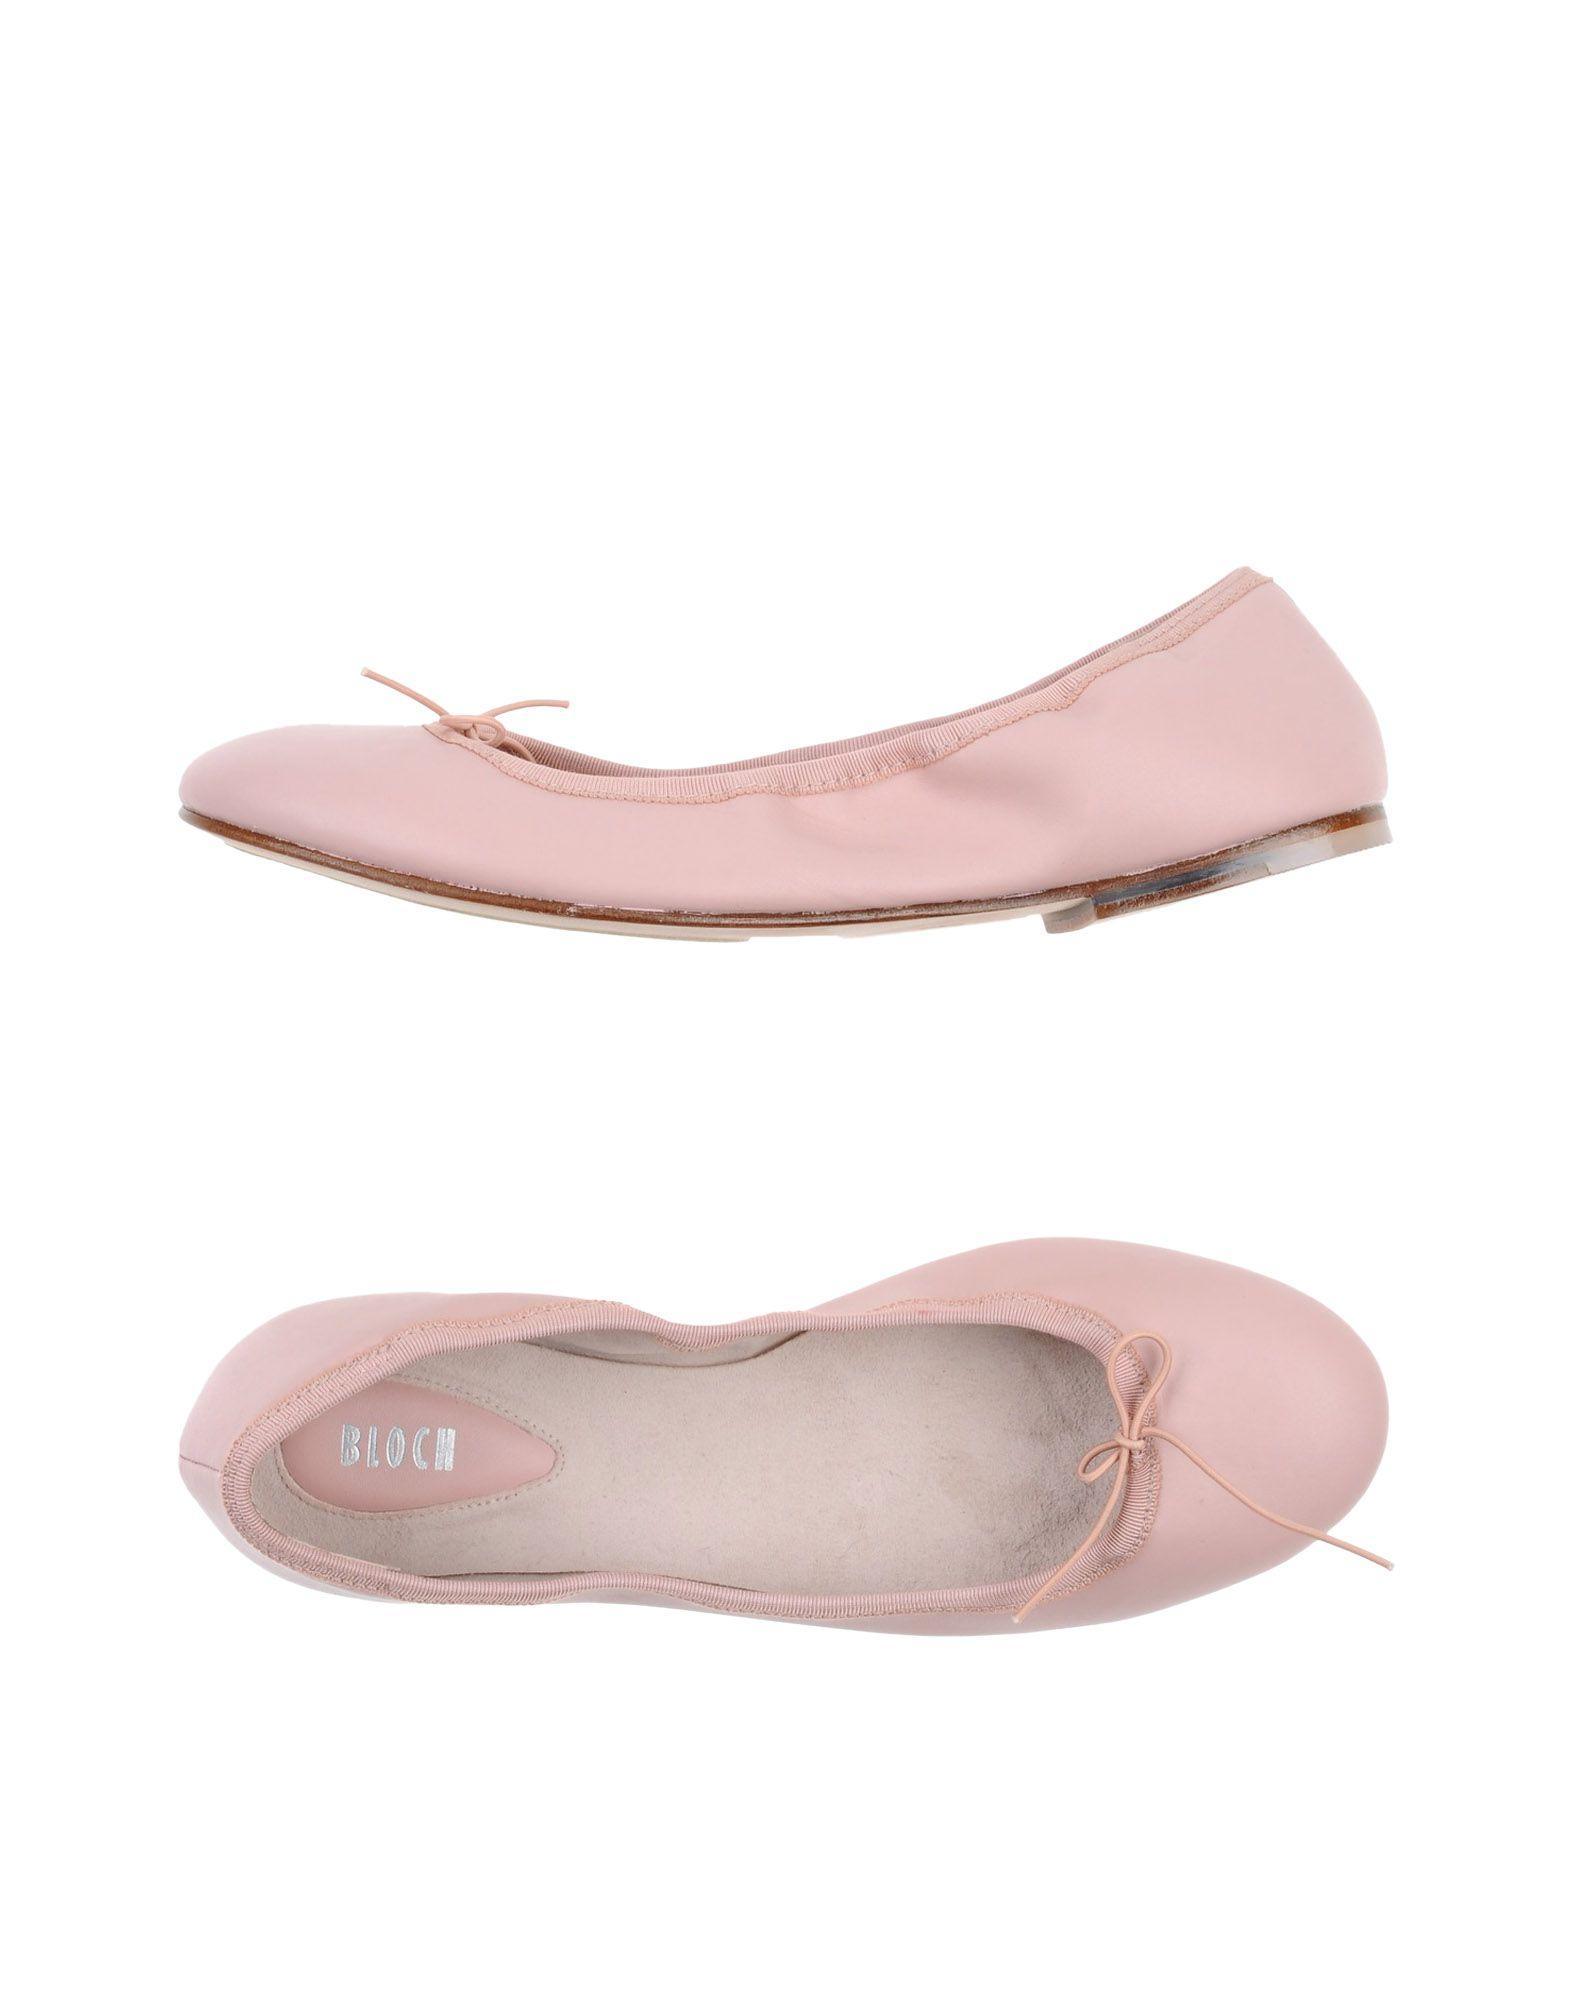 Bloch White Ballet Shoes